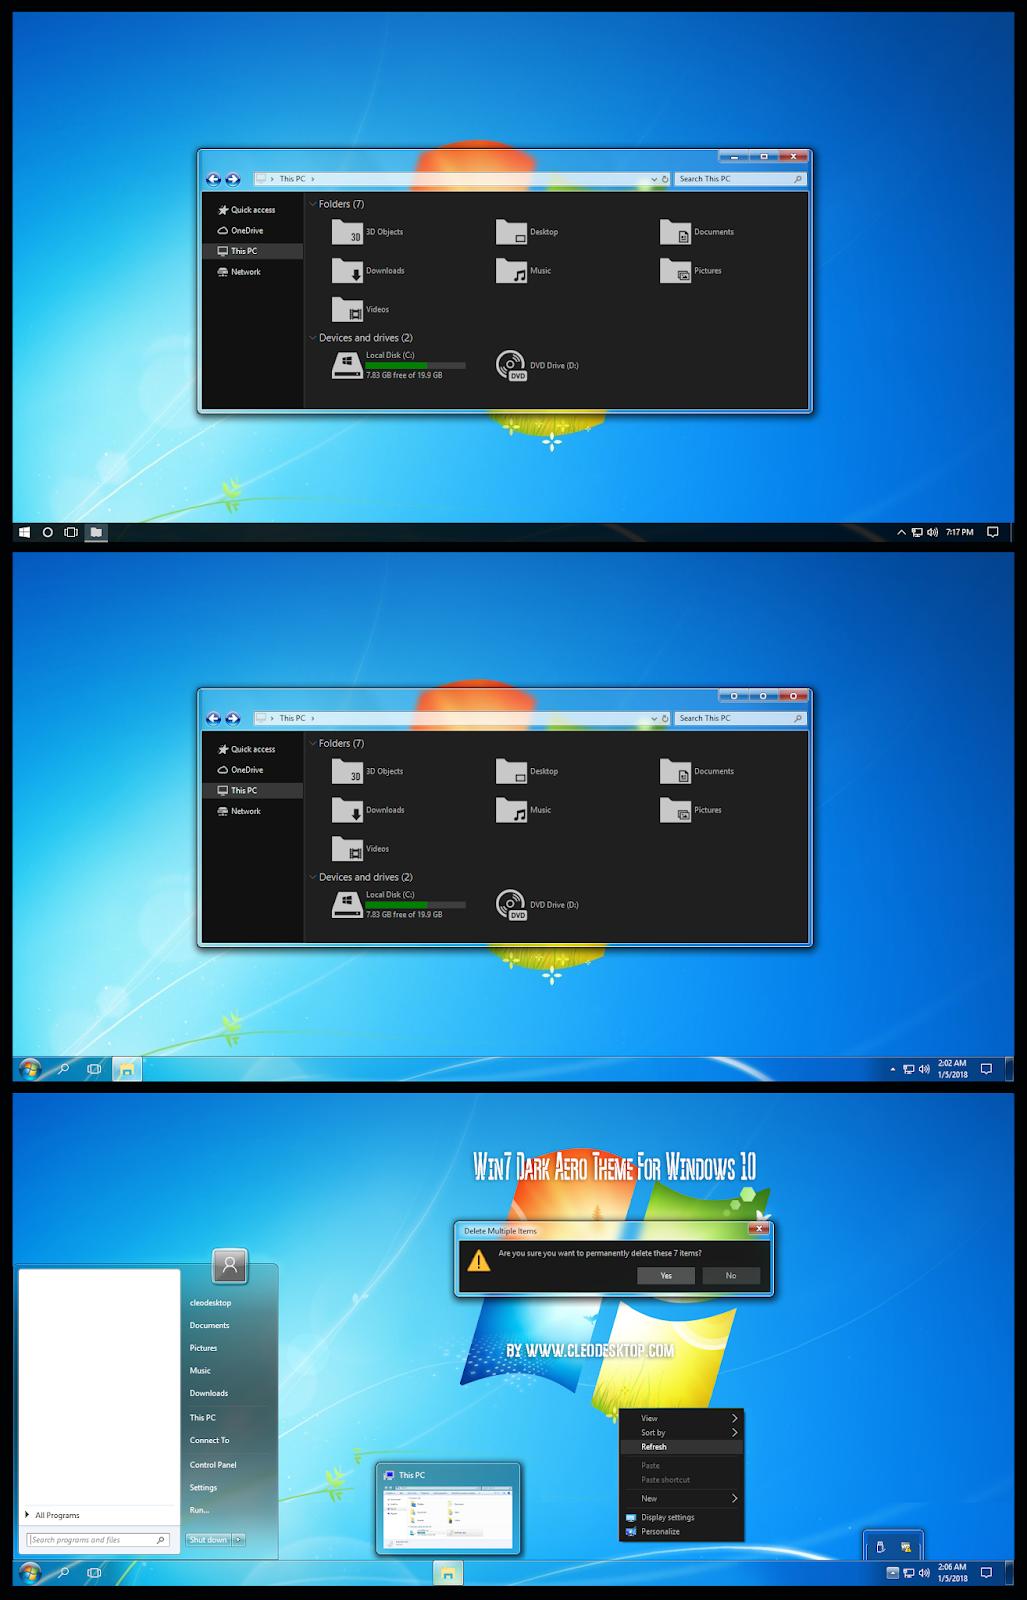 Windows 7 Dark Aero Theme Windows10 November 2019 Update 1909 Cleodesktop I Customized Desktop Windows Theme Dark